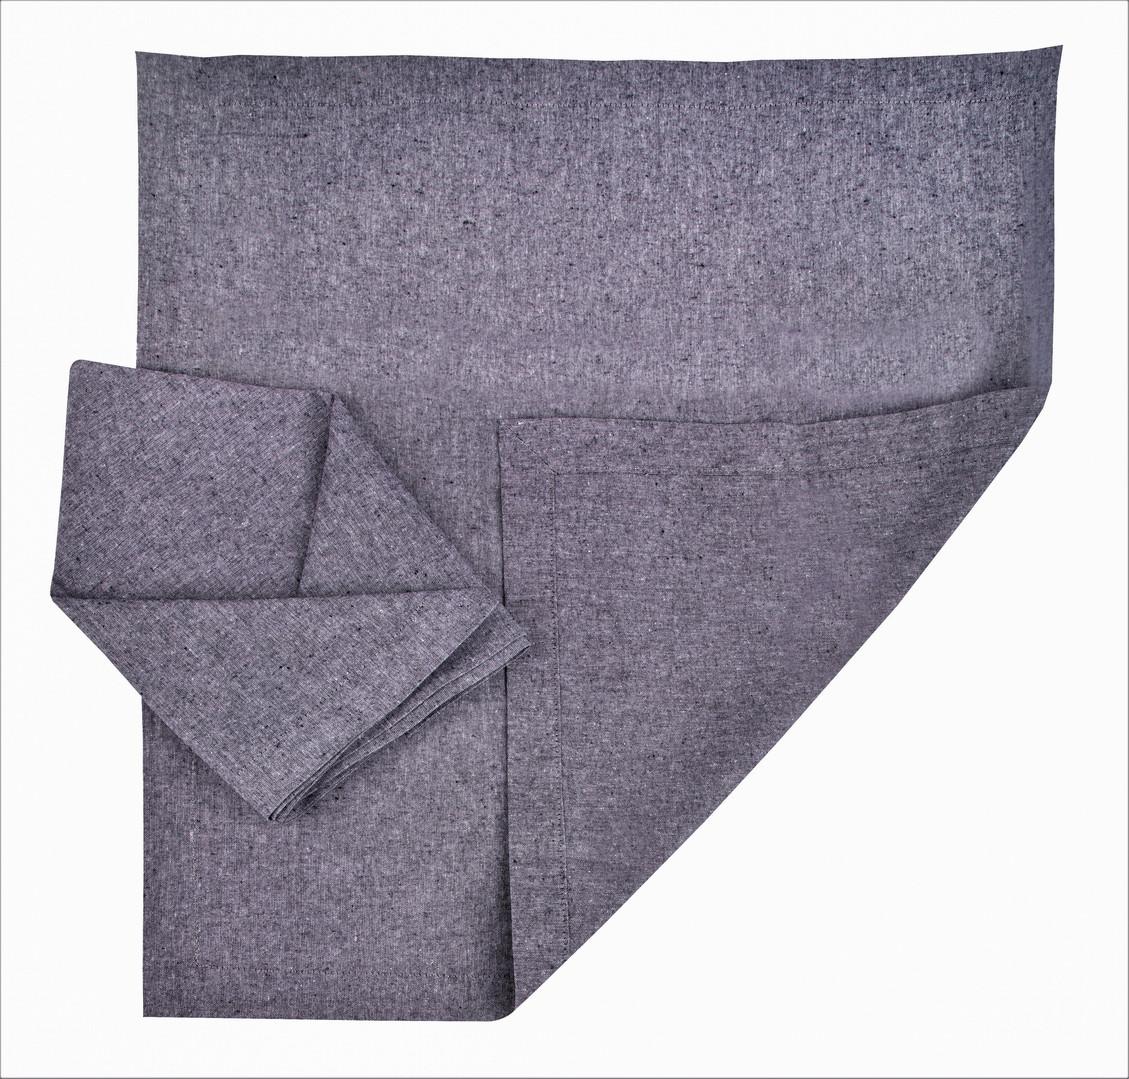 Atmos Green Recycled Cotton Napkins - Grey Color